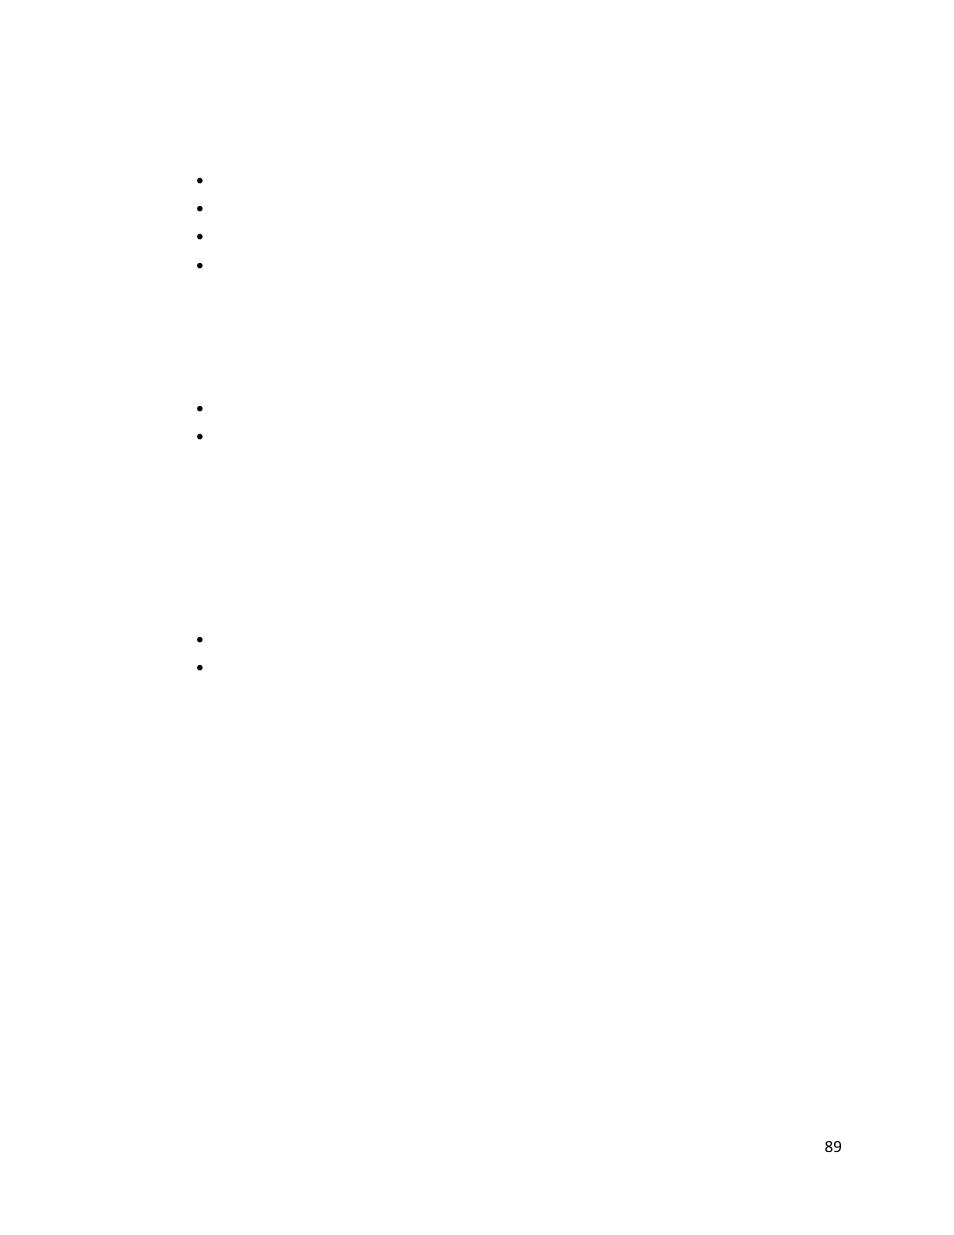 Printronix T2N User Manual | Page 89 / 150